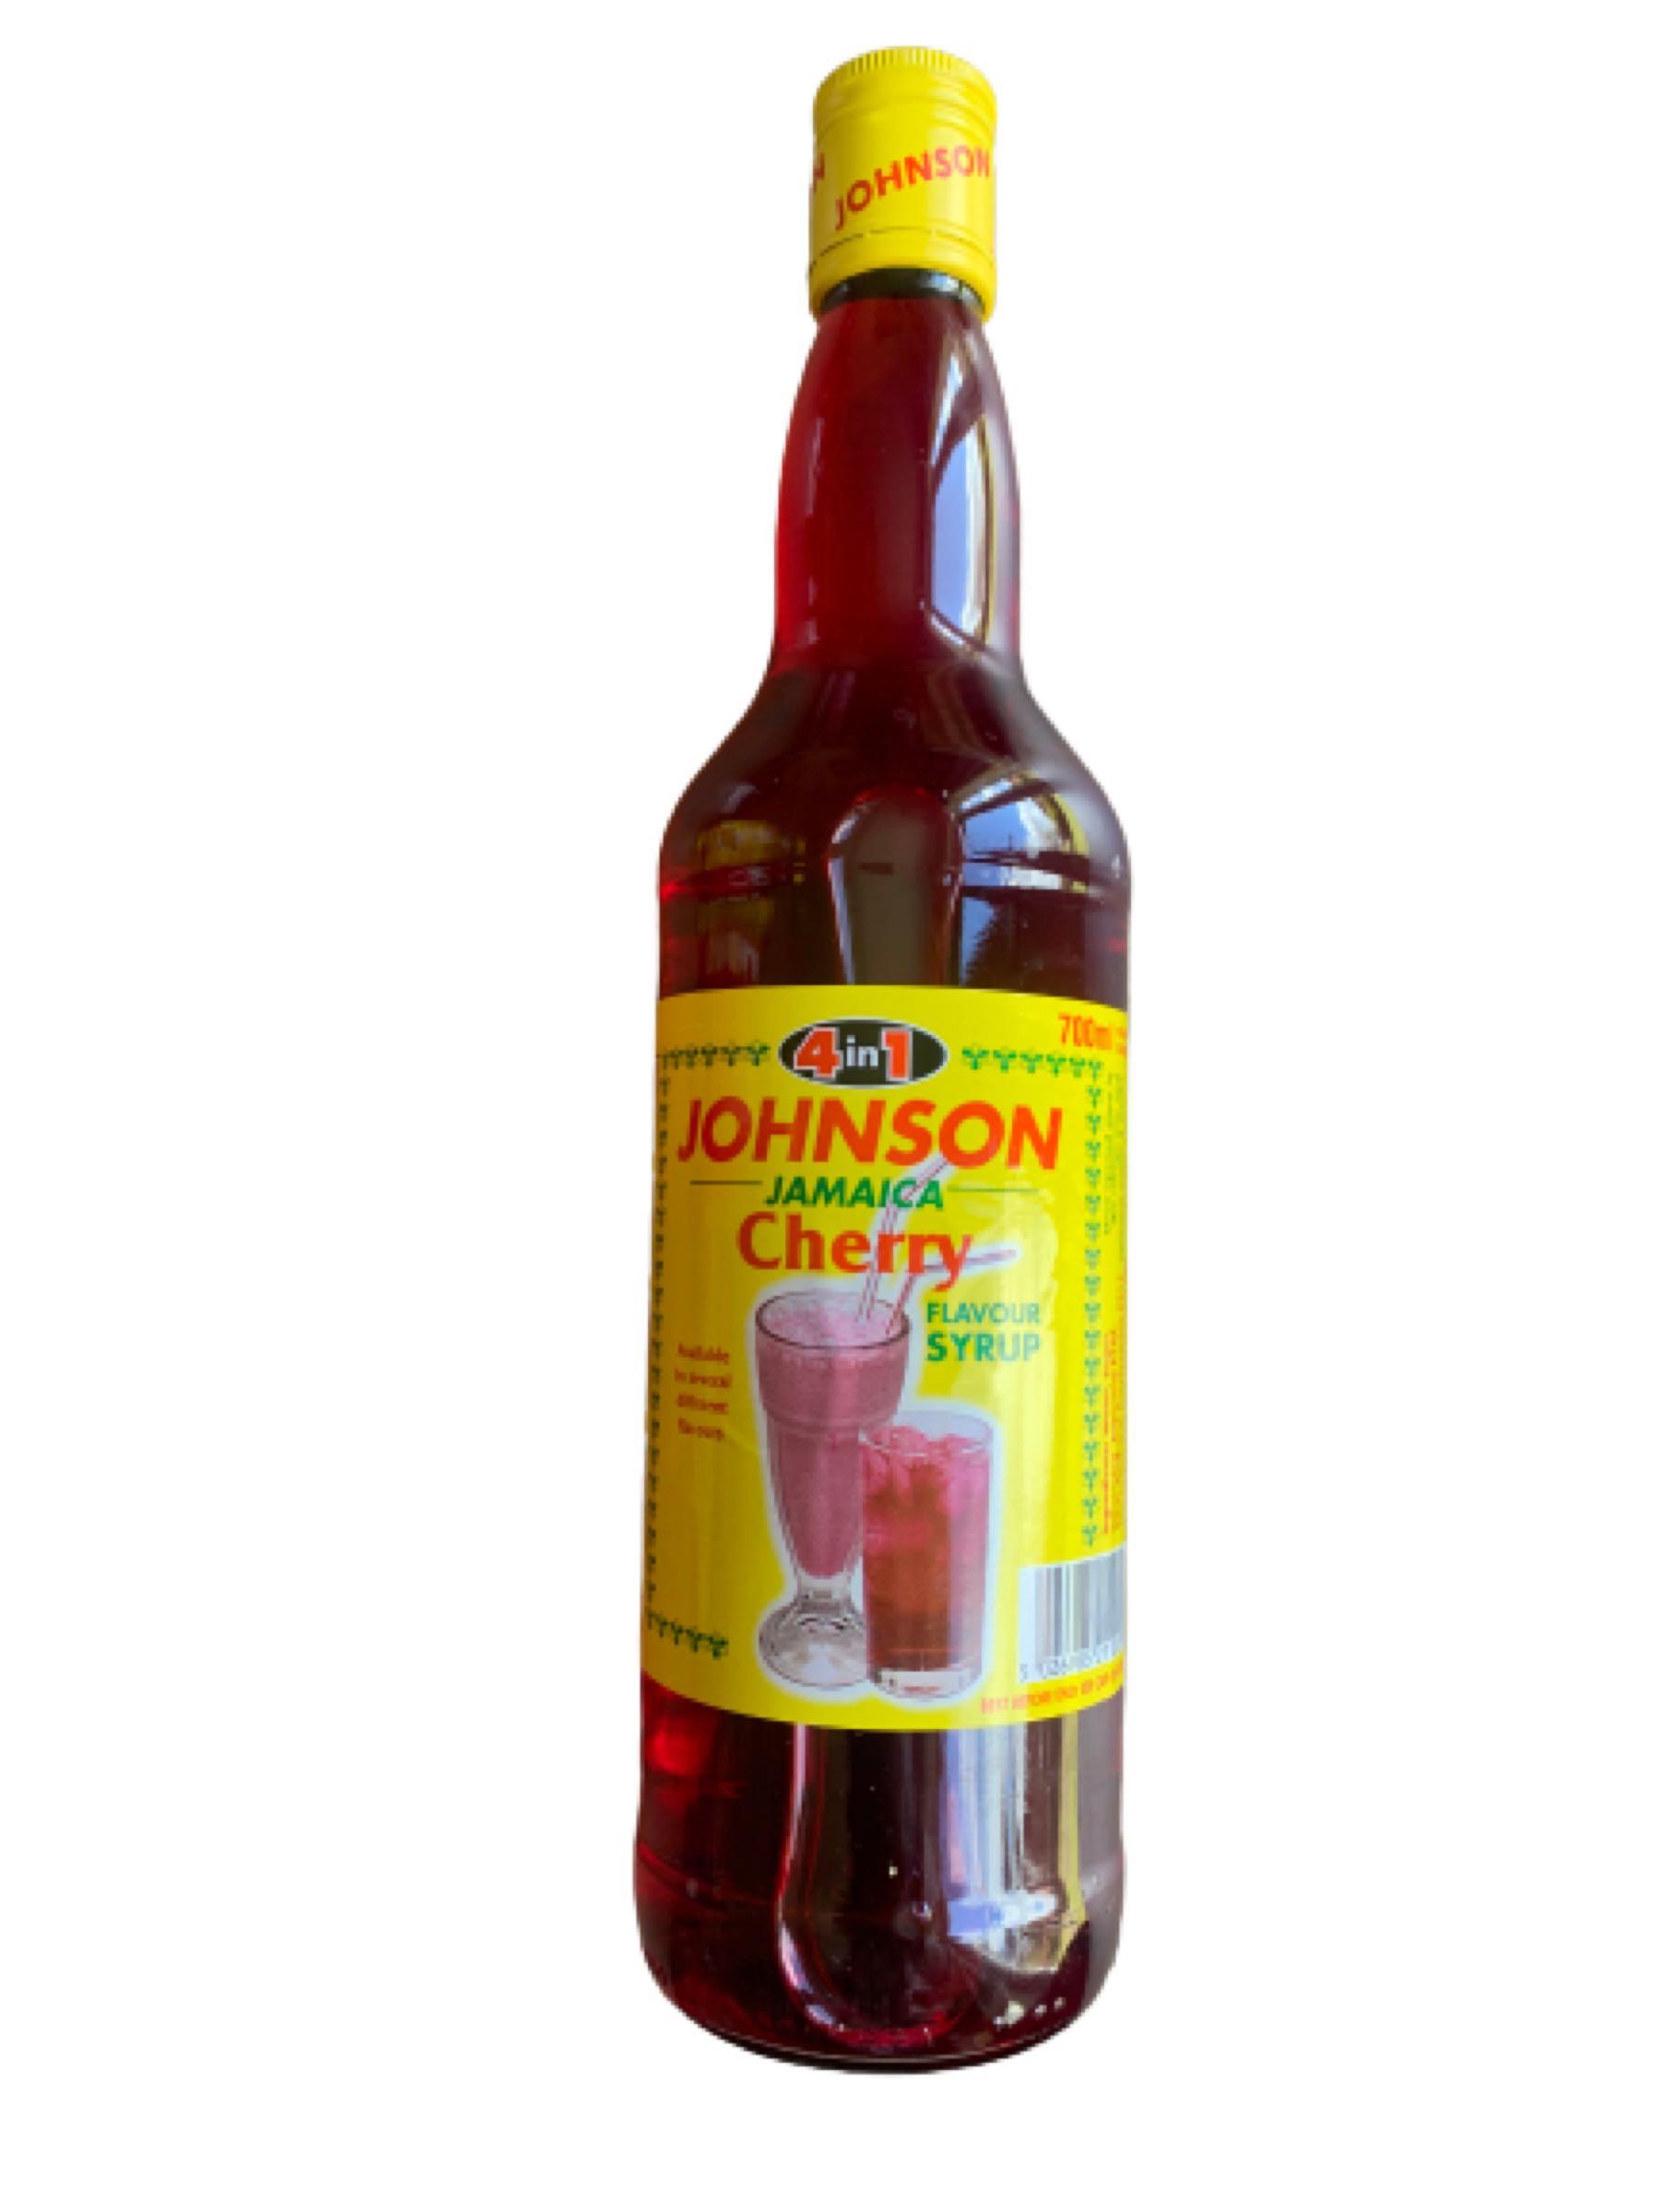 Johnson's 4-1 Cherry Syrup